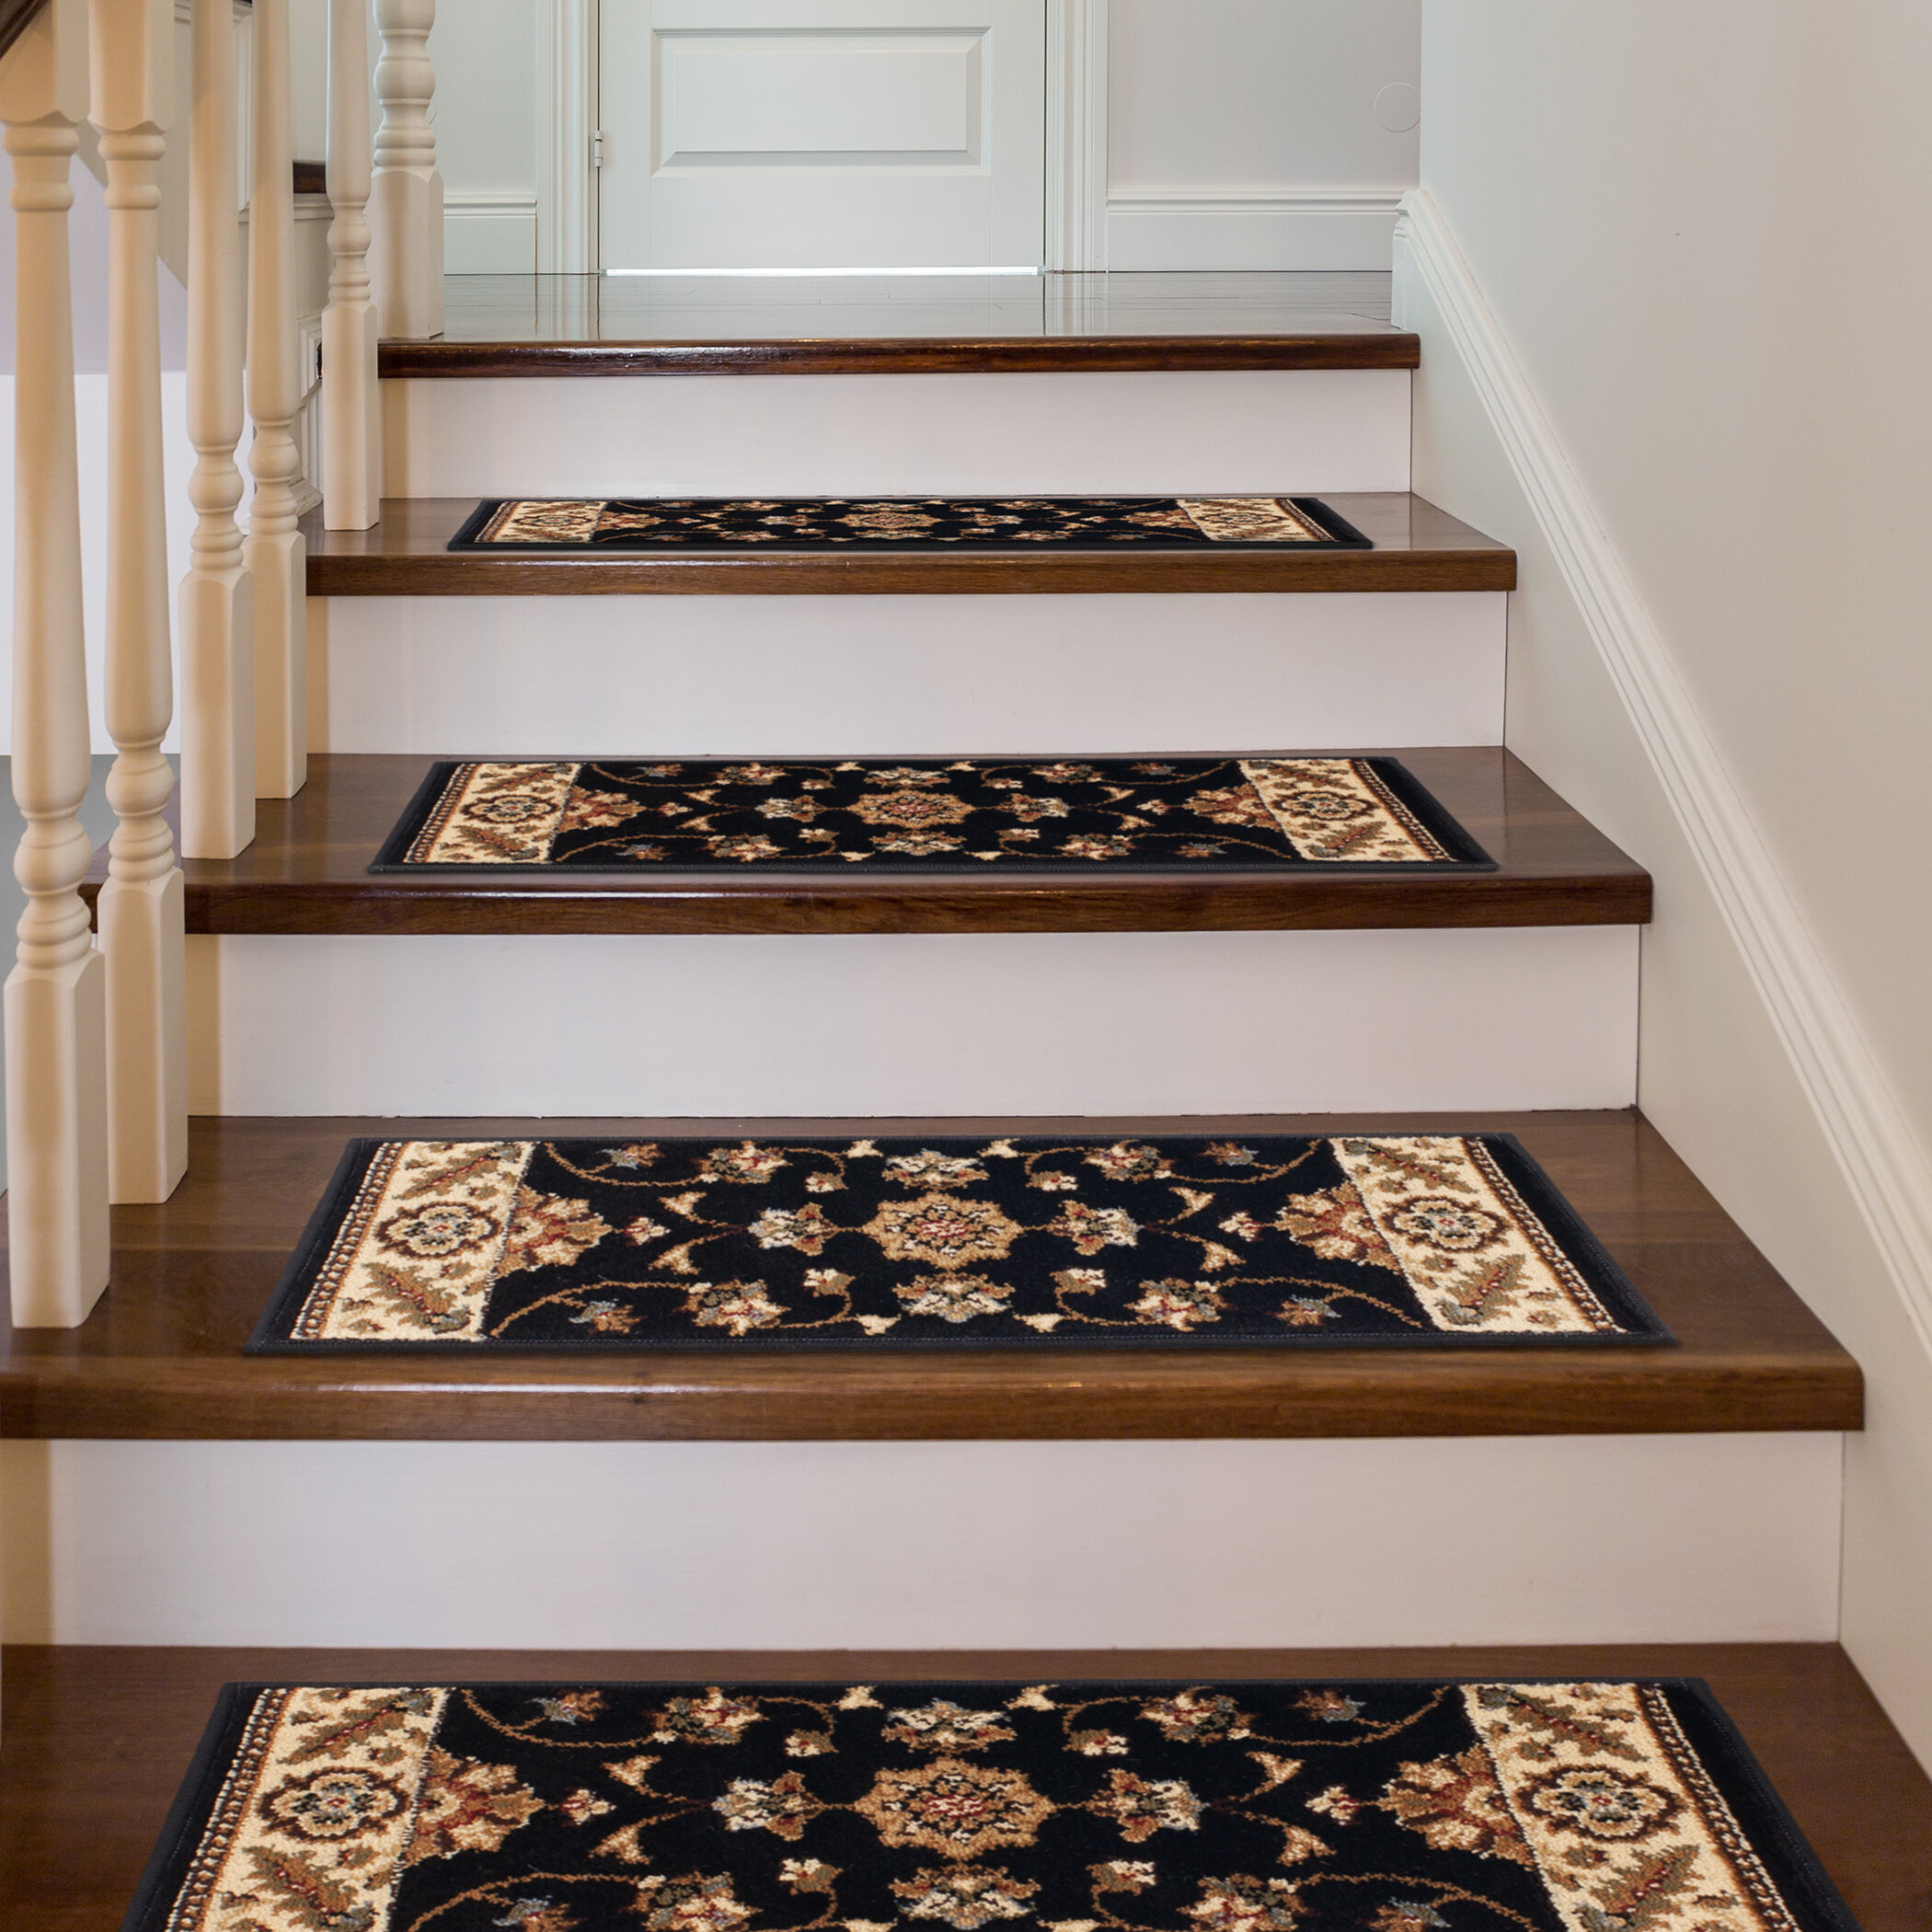 Astoria Grand Athol Stair Tread